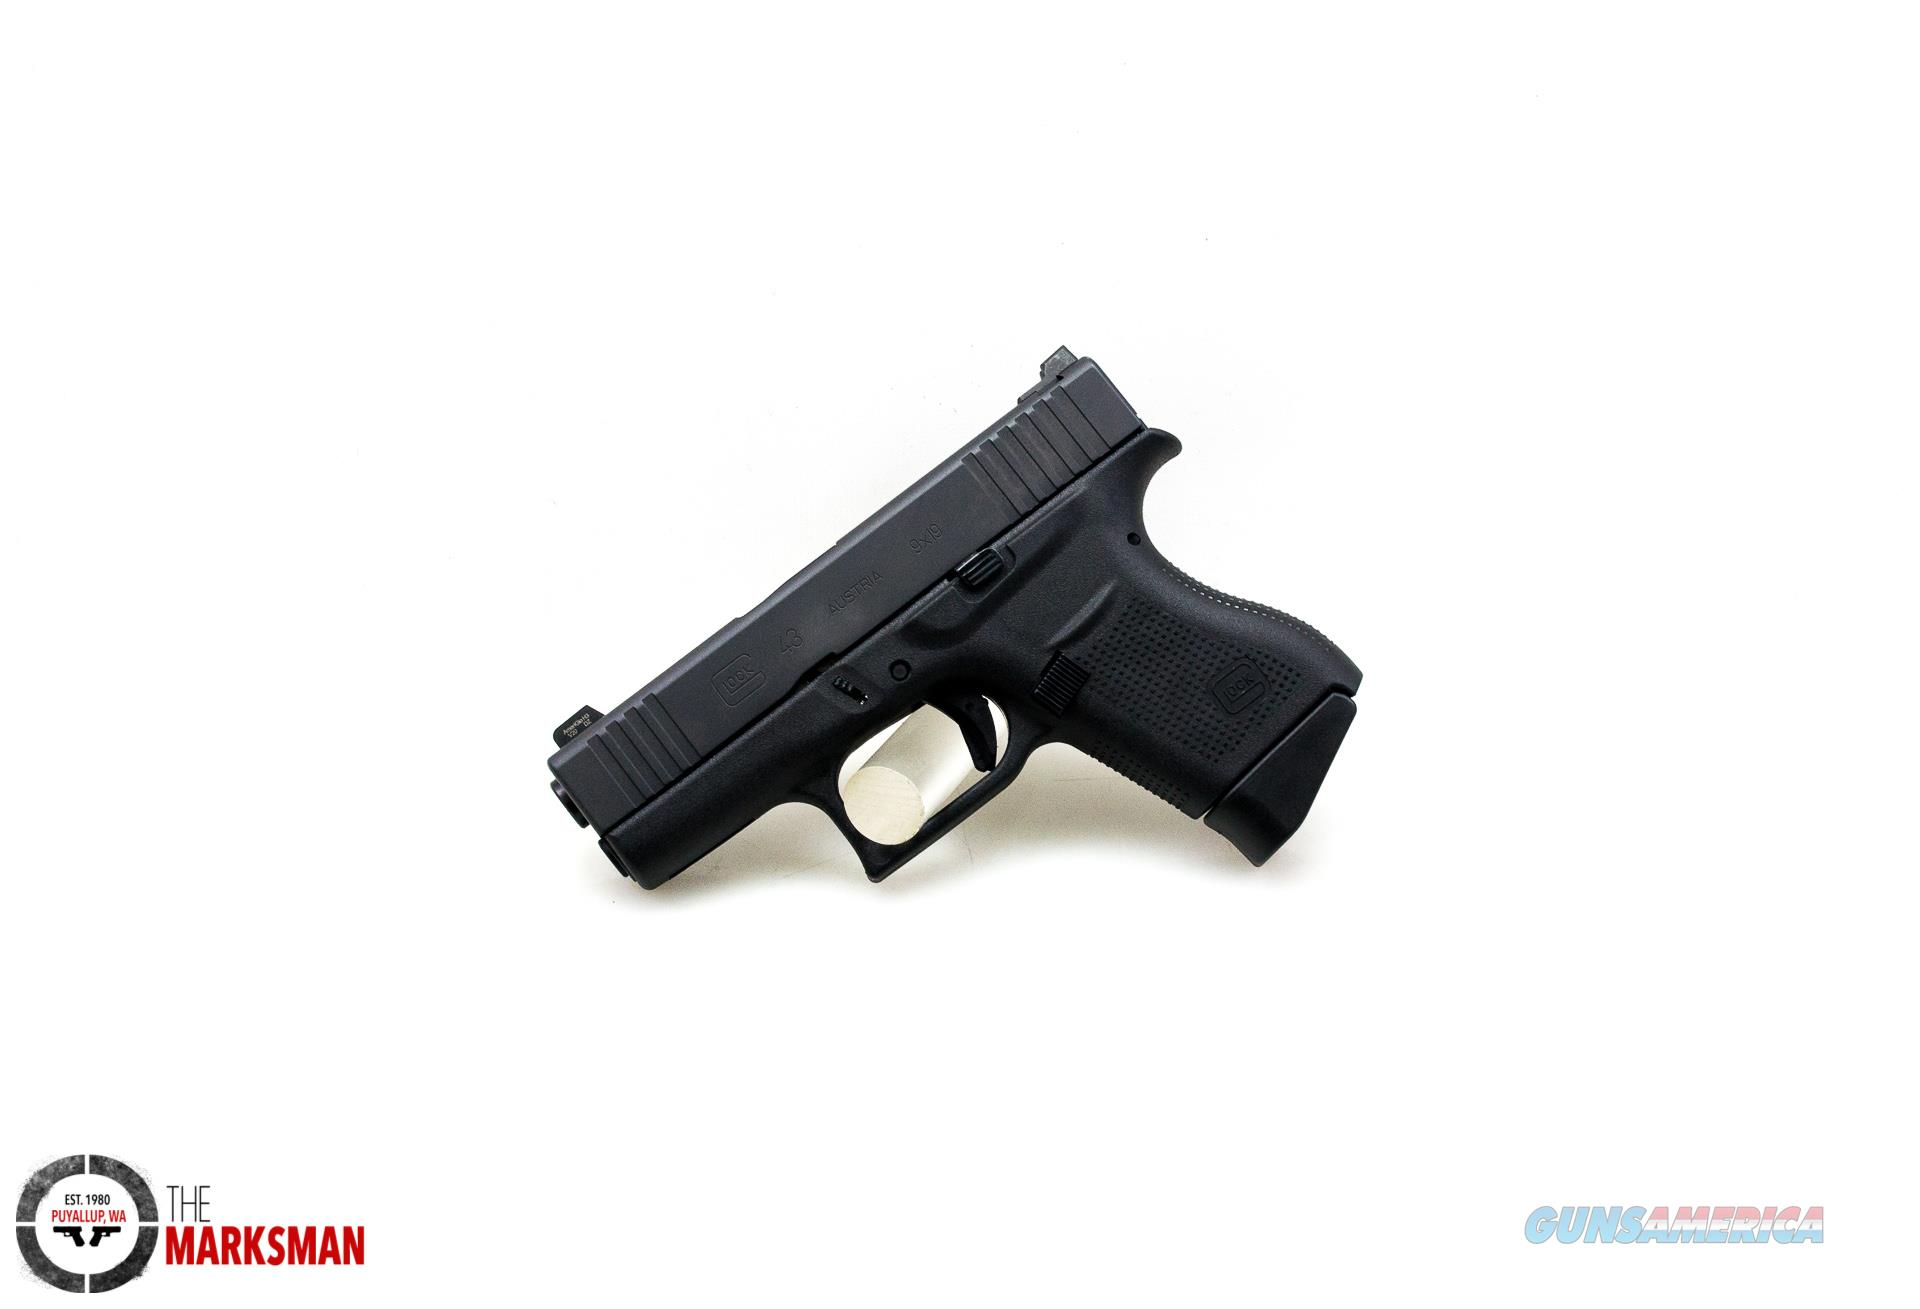 Glock 43 Vicker's Tactical, 9mm, Lipsey's Exclusive NEW  Guns > Pistols > Glock Pistols > 43/43X